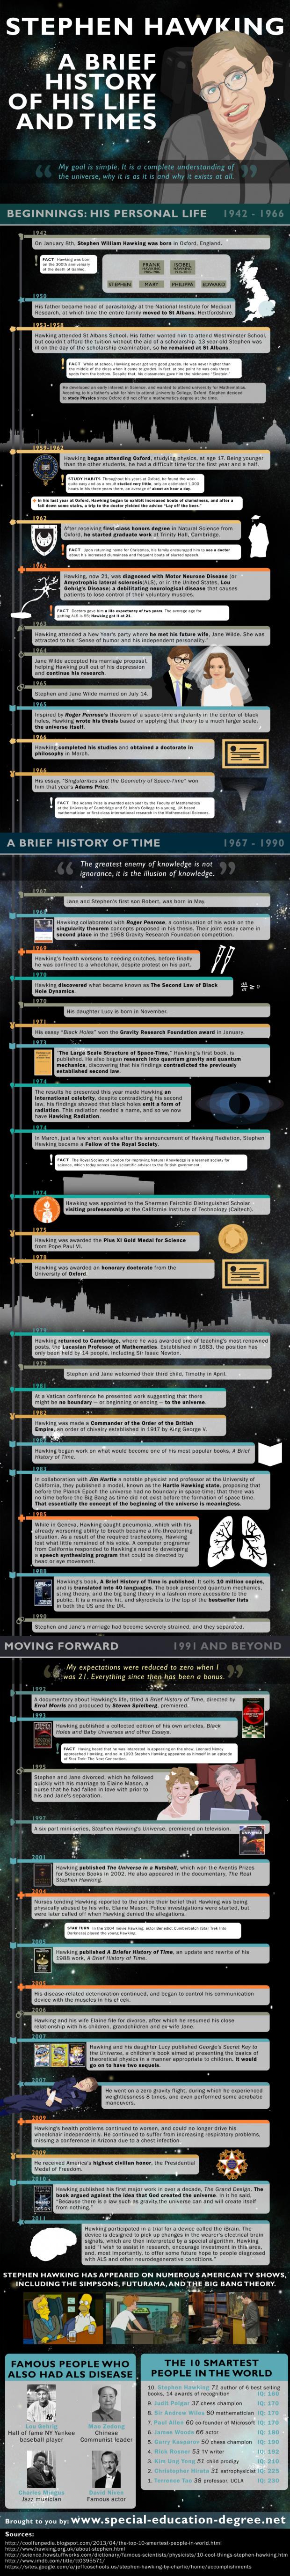 02 Stephen-Hawking-Infographic-620x5504